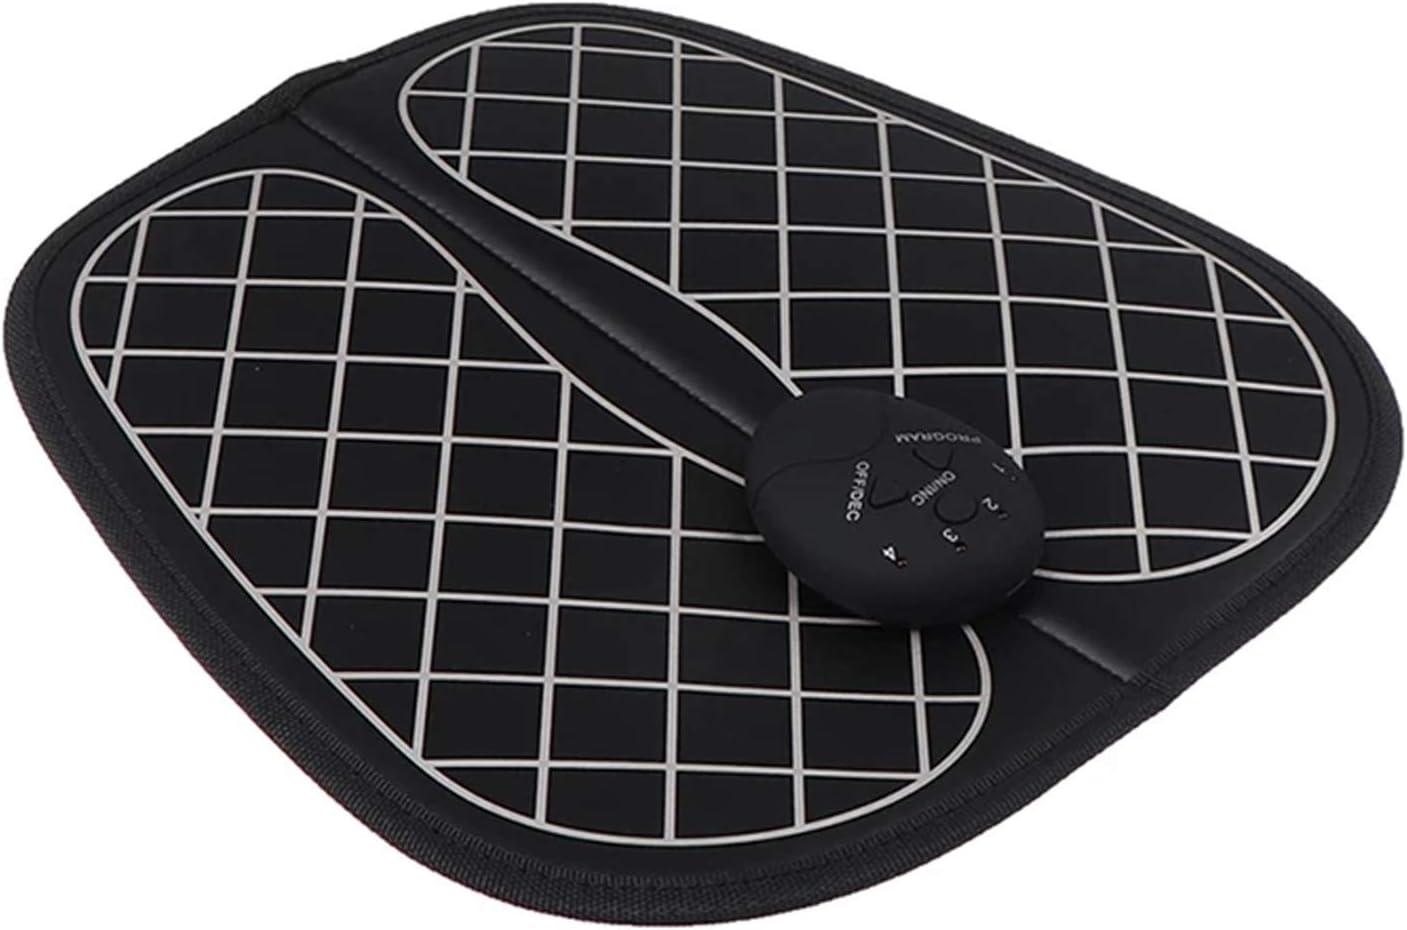 half SXFYMWY Heated Max 65% OFF Foot Massage Portable - Device Elect